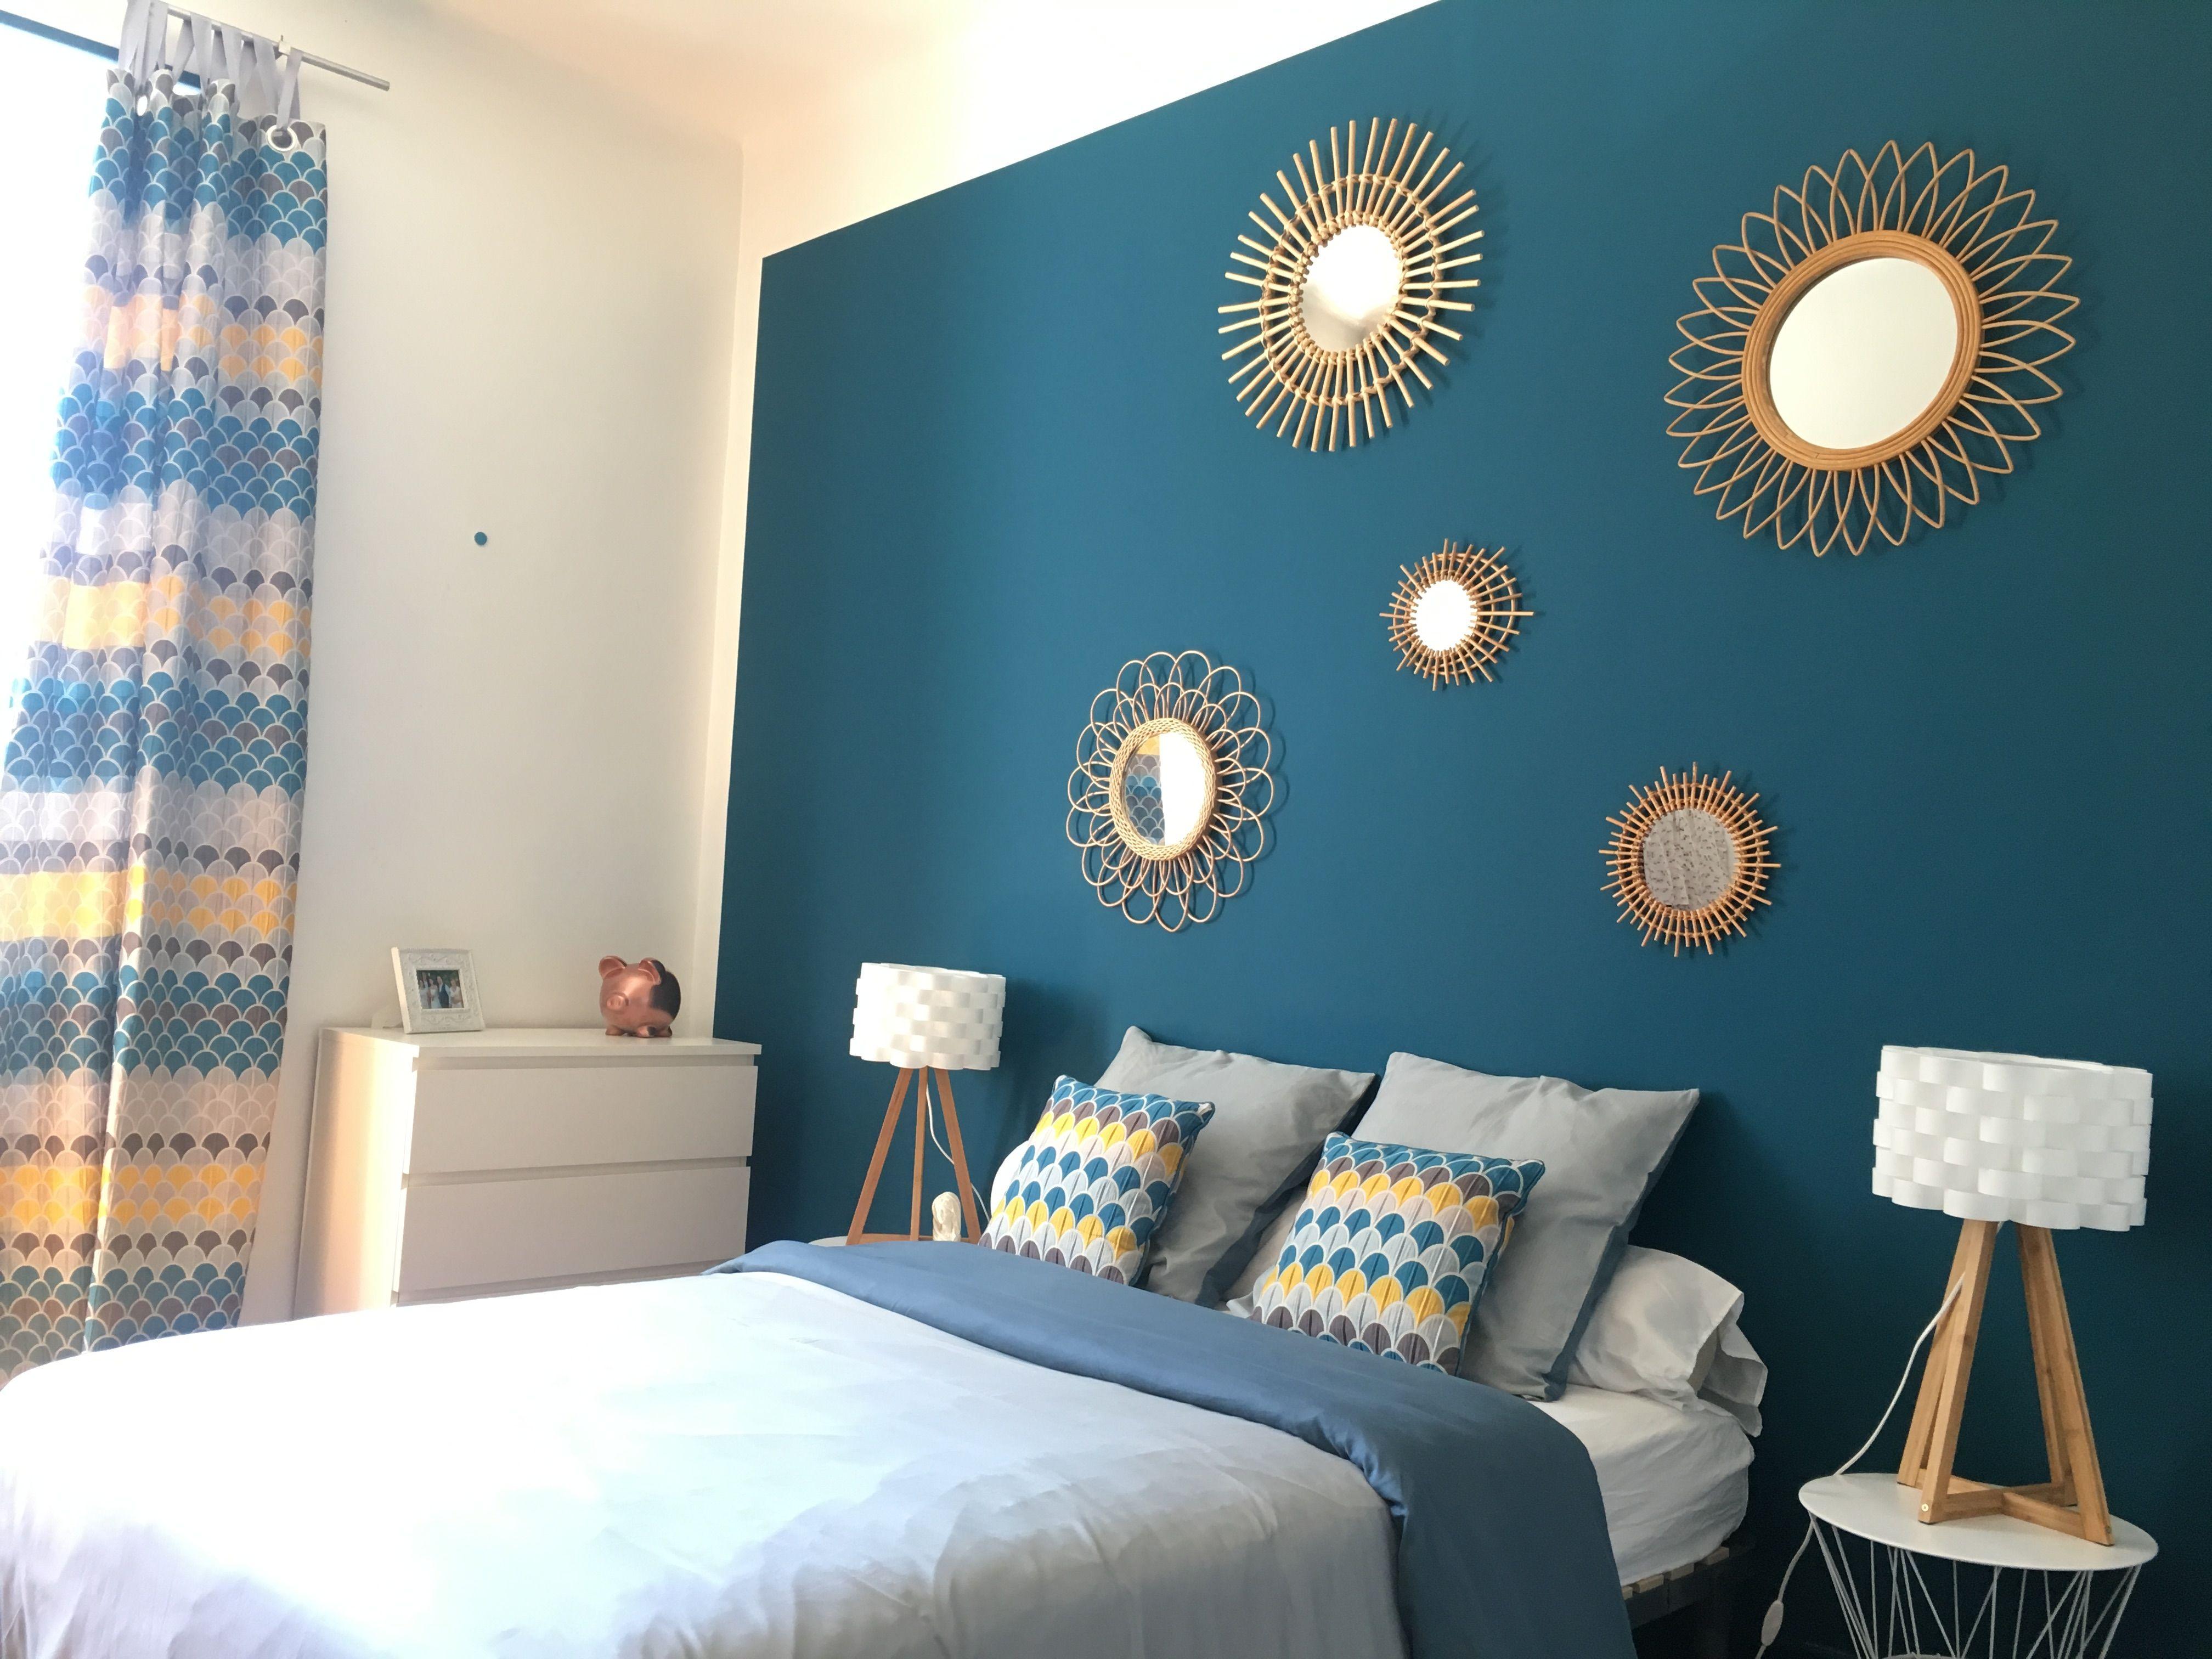 Chambre  Déco chambre parents, Deco chambre bleu, Deco chambre